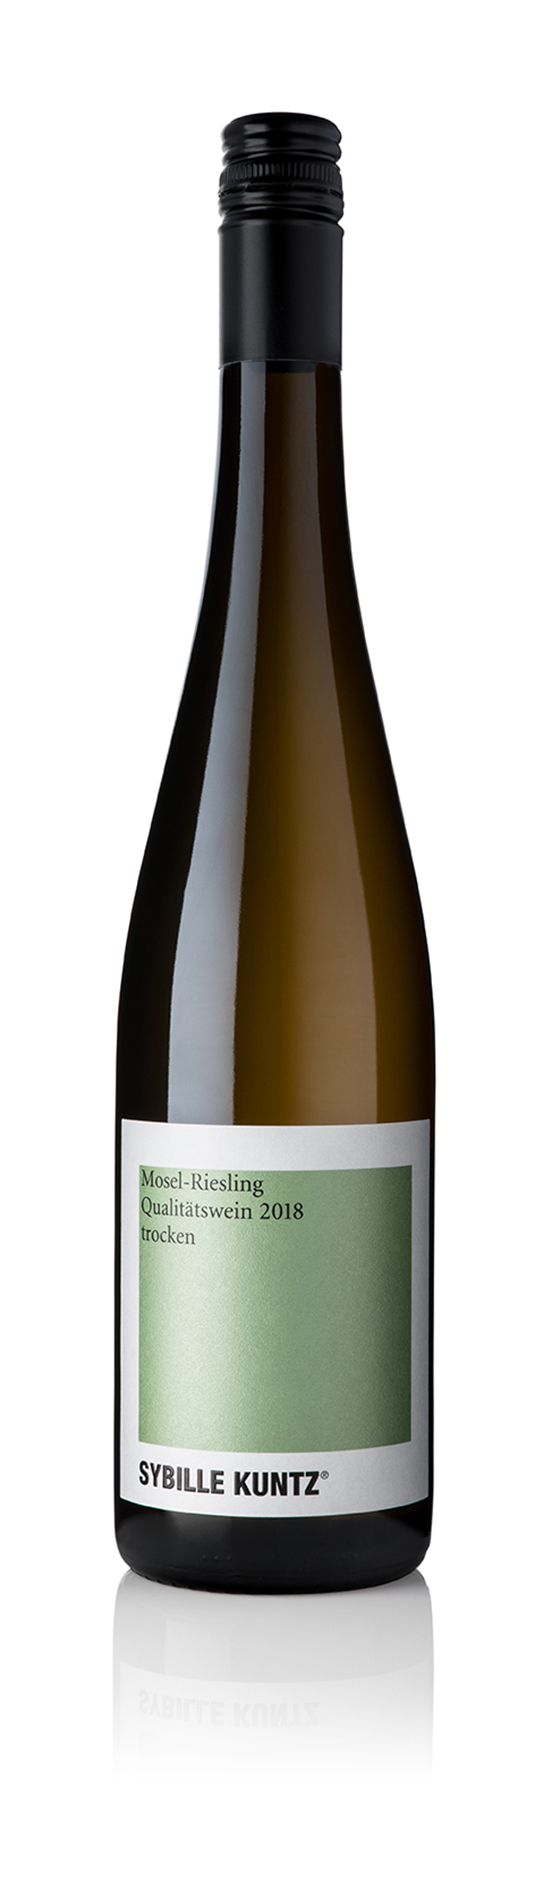 2018 SYBILLE KUNTZ Mosel-Riesling Qualitätswein trocken 0,75 l